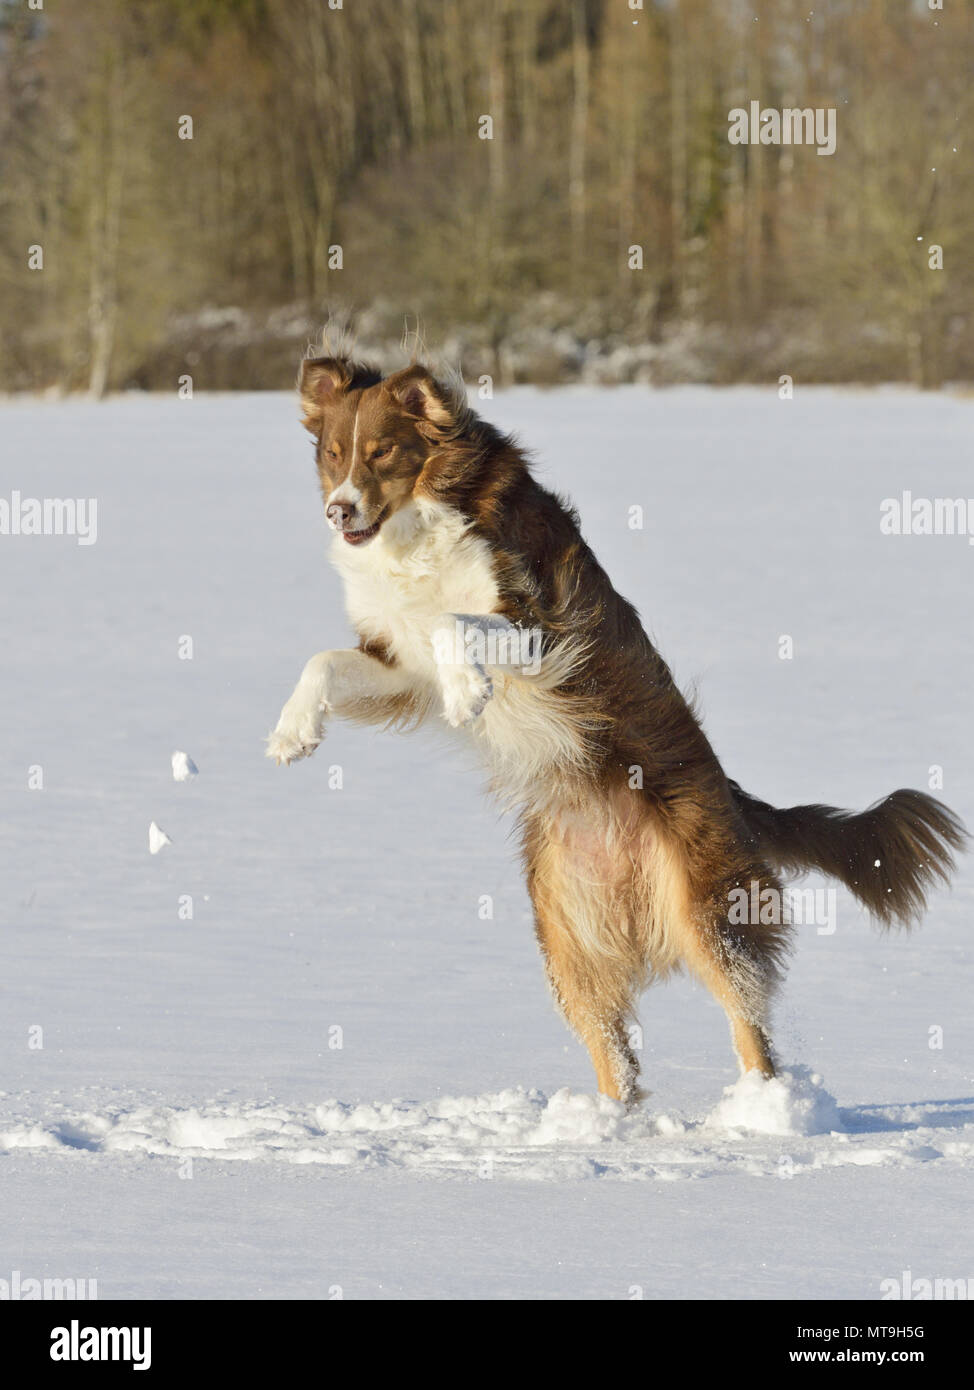 Australian Shepherd. Adult dog leaping in snow. Germany - Stock Image